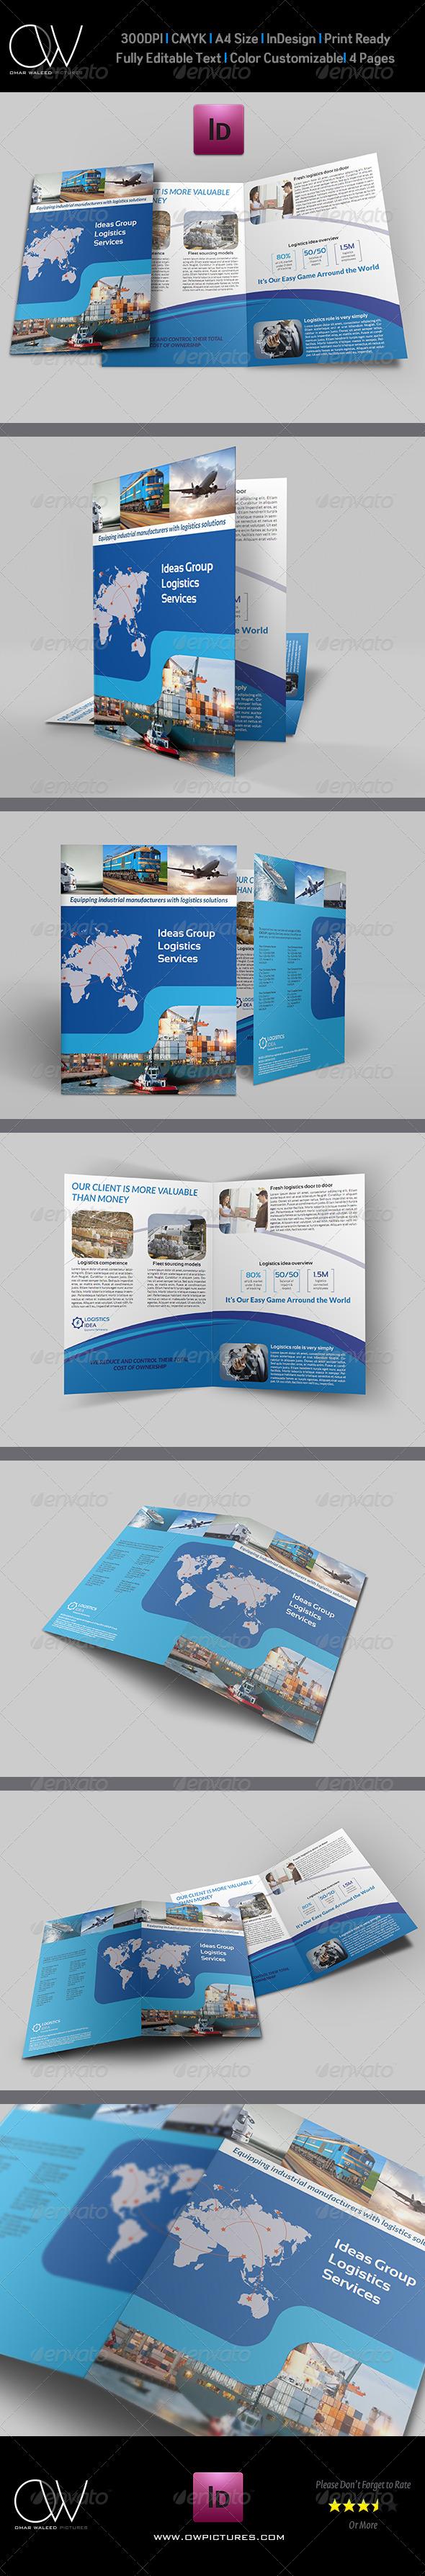 Sample Bi Fold Brochure | Logistics Services Bi Fold Brochure Template Bi Fold Brochure